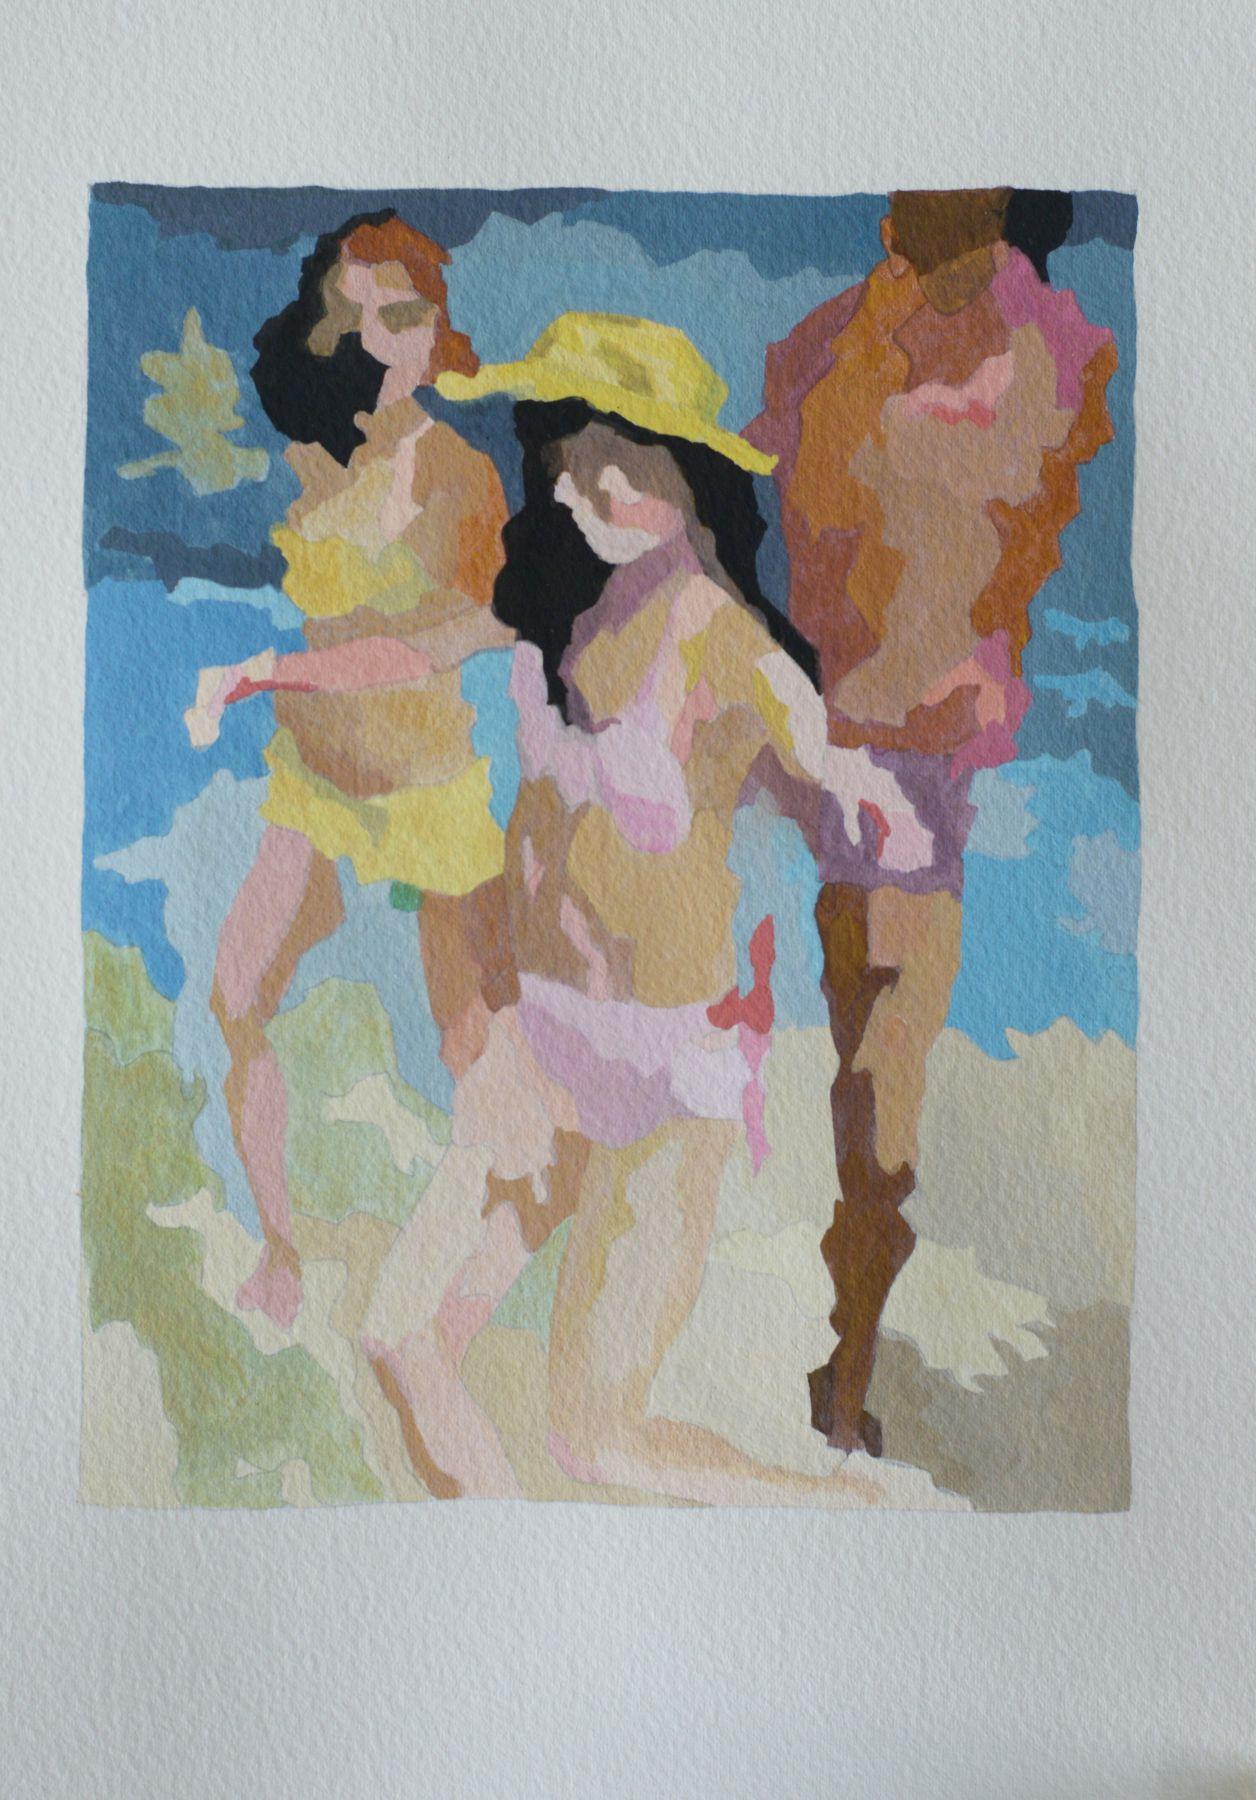 RUTH OWENS, Beach Dance (study), 2018